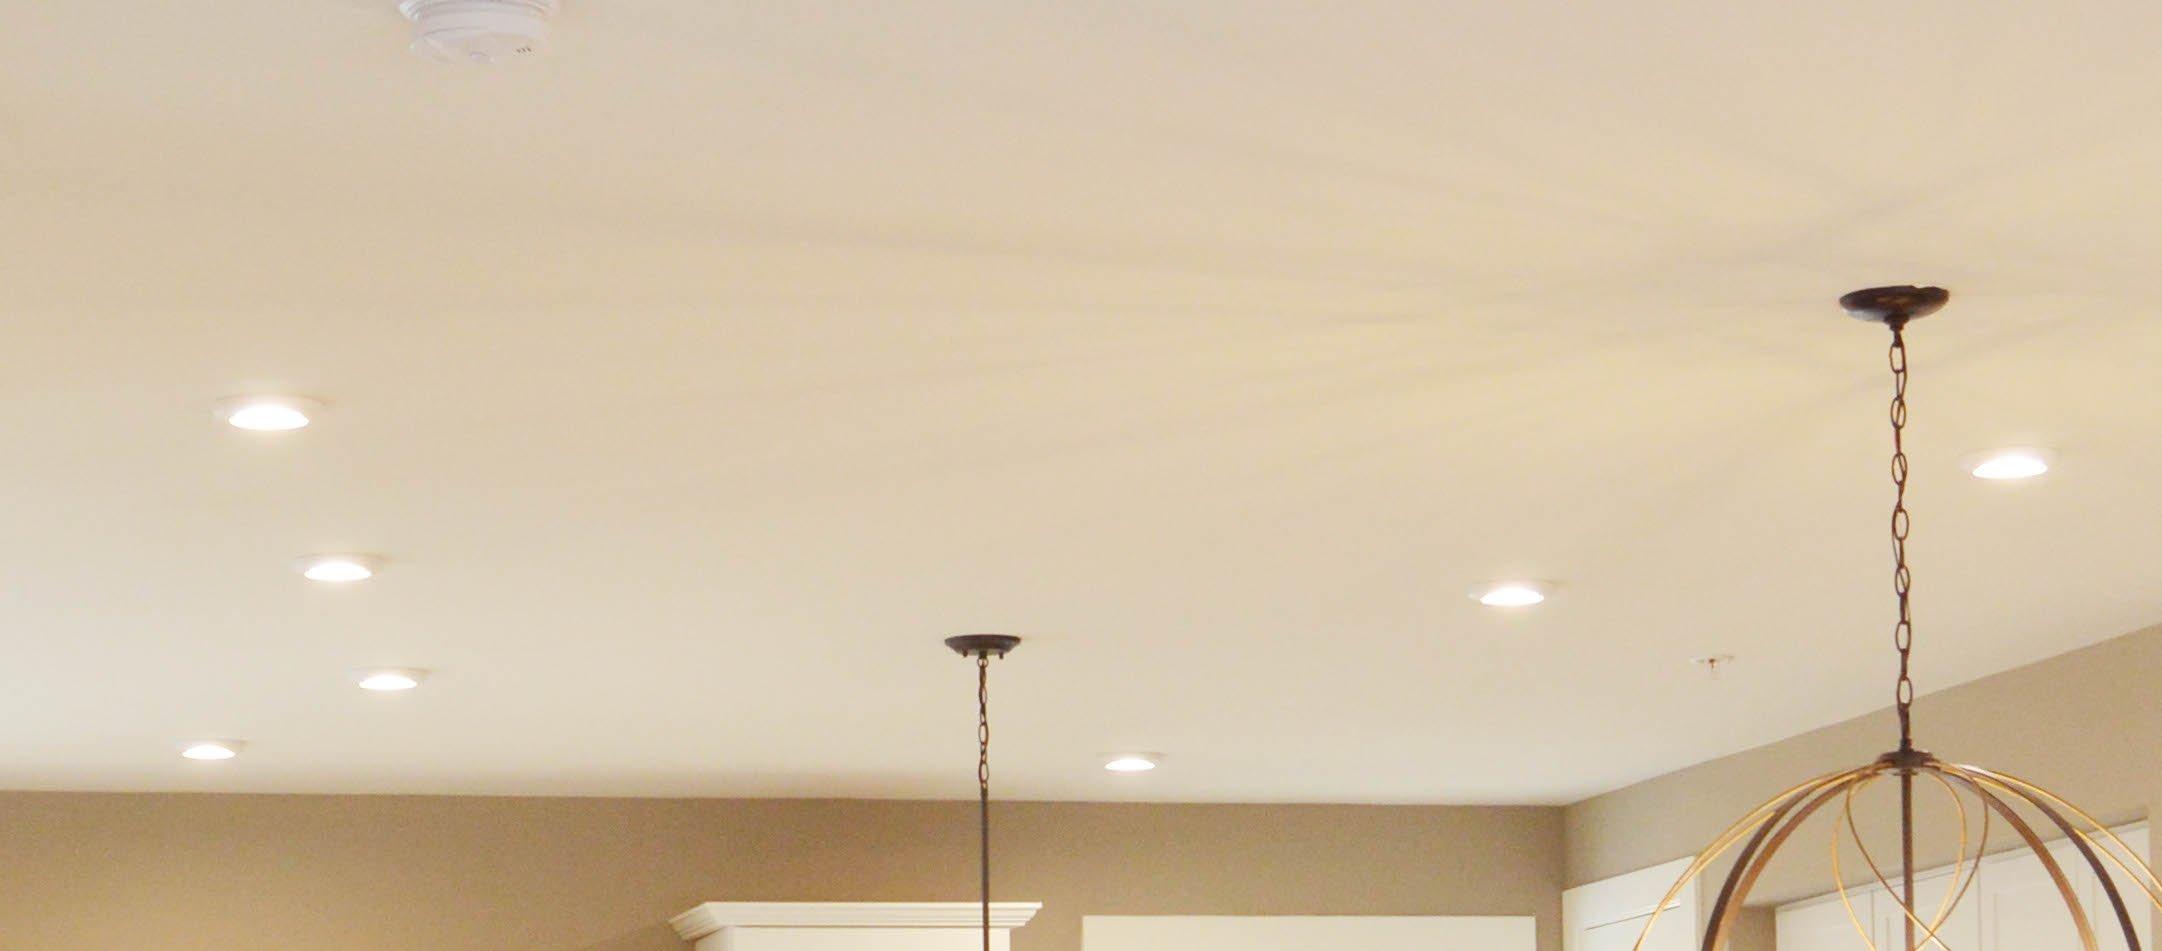 Recessed Lighting Crofton Electricians 21114